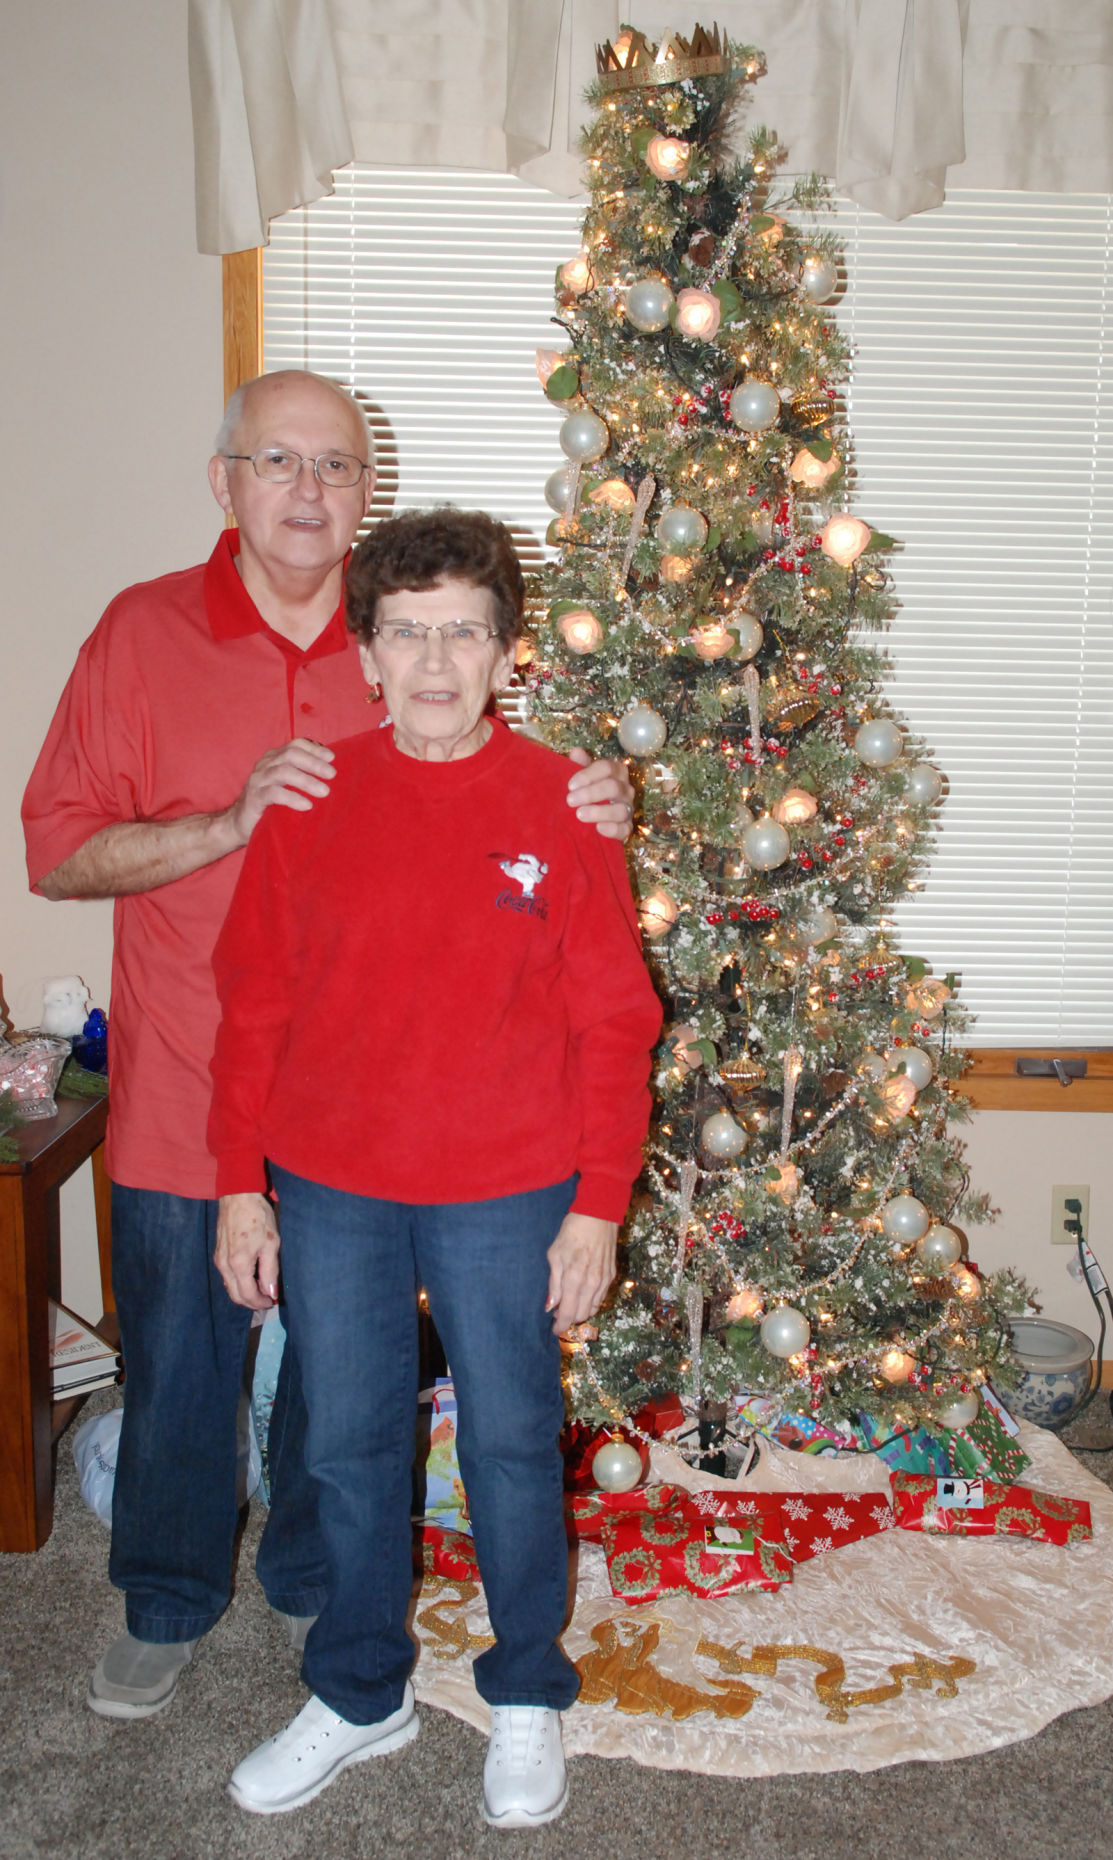 Christmas House Couple and tree